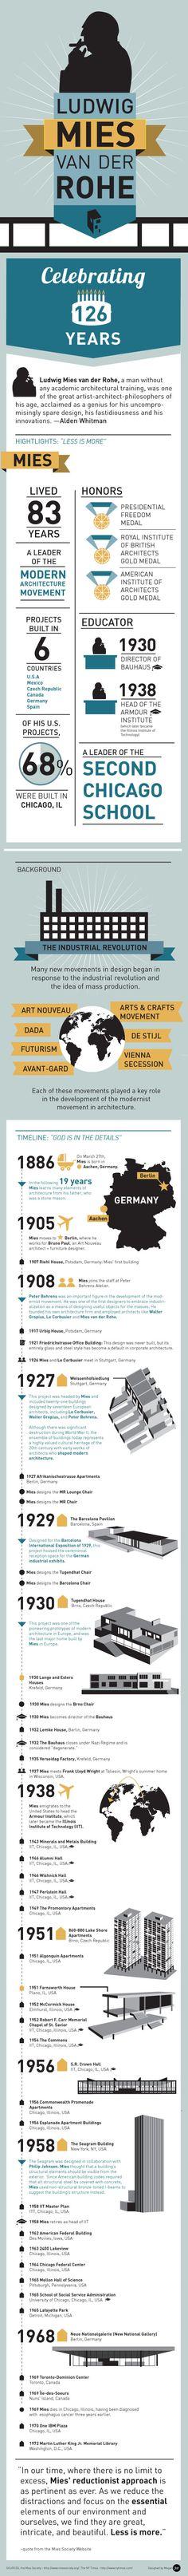 Infographic: Celebrating Mies van der Rohe.